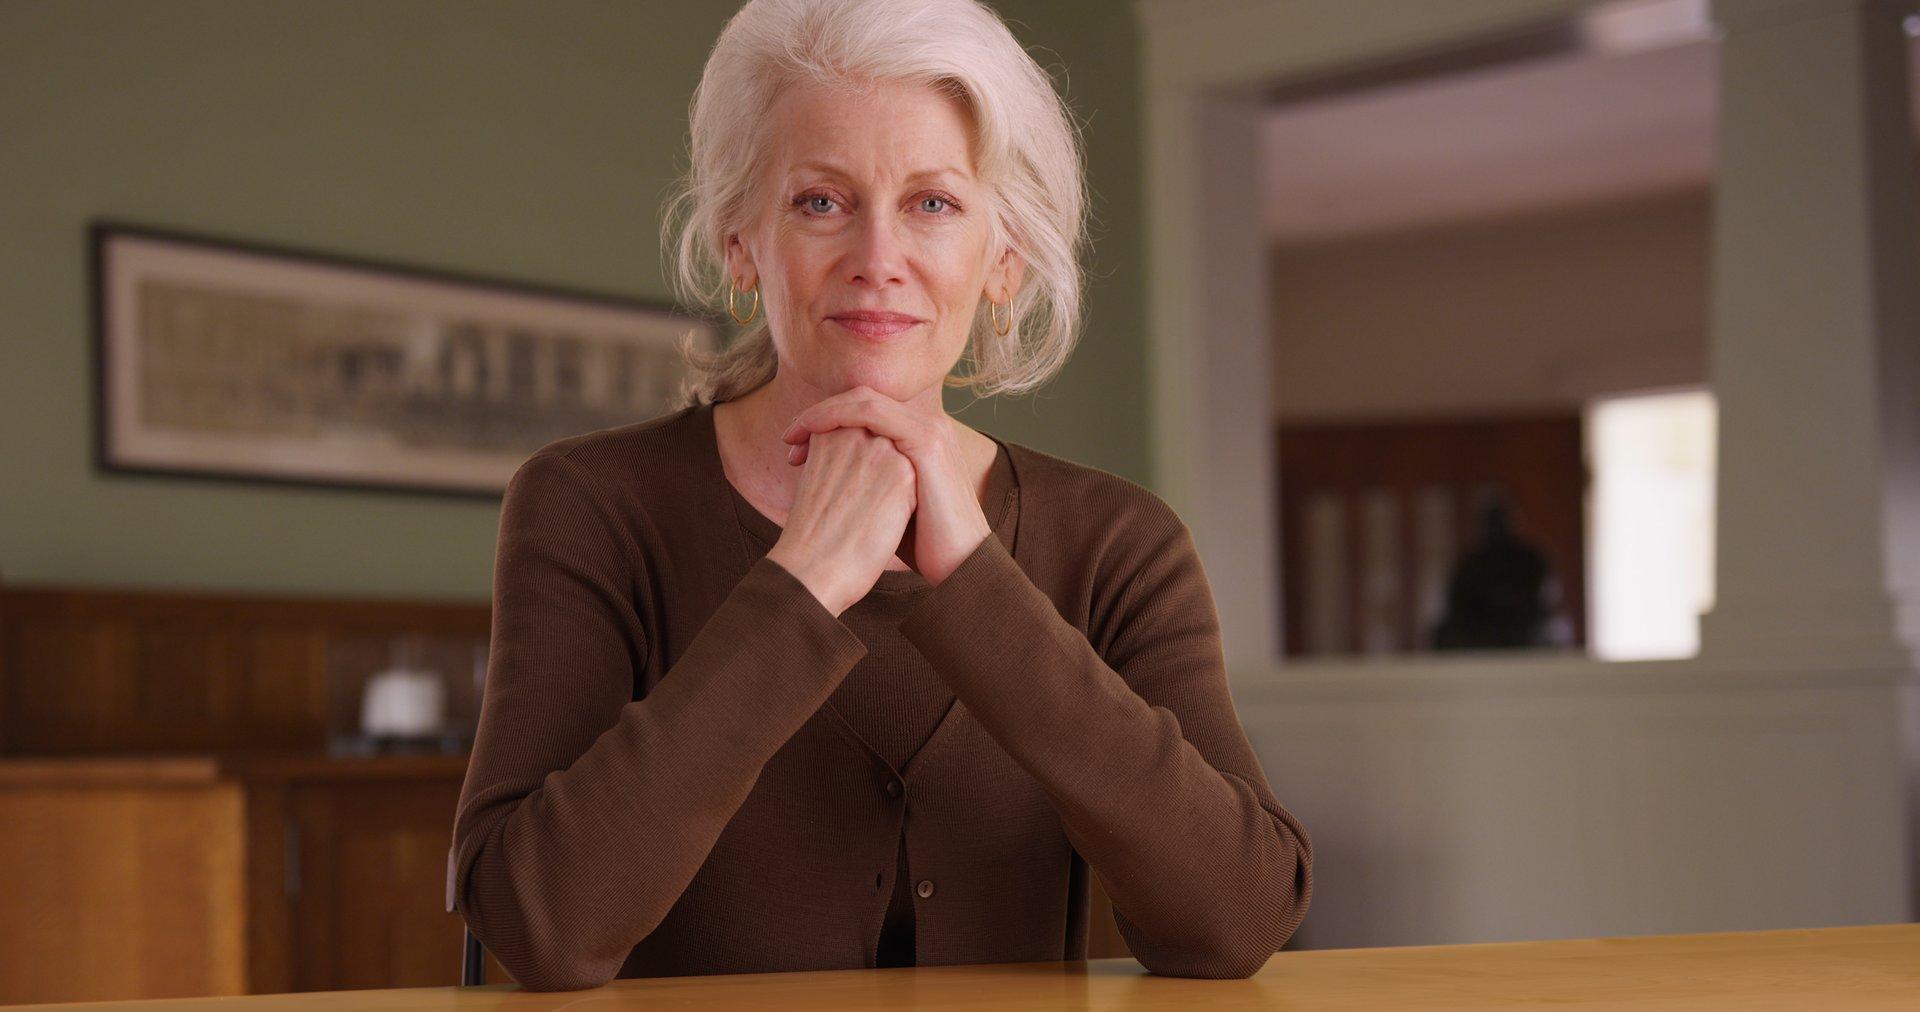 Senior woman homeowner